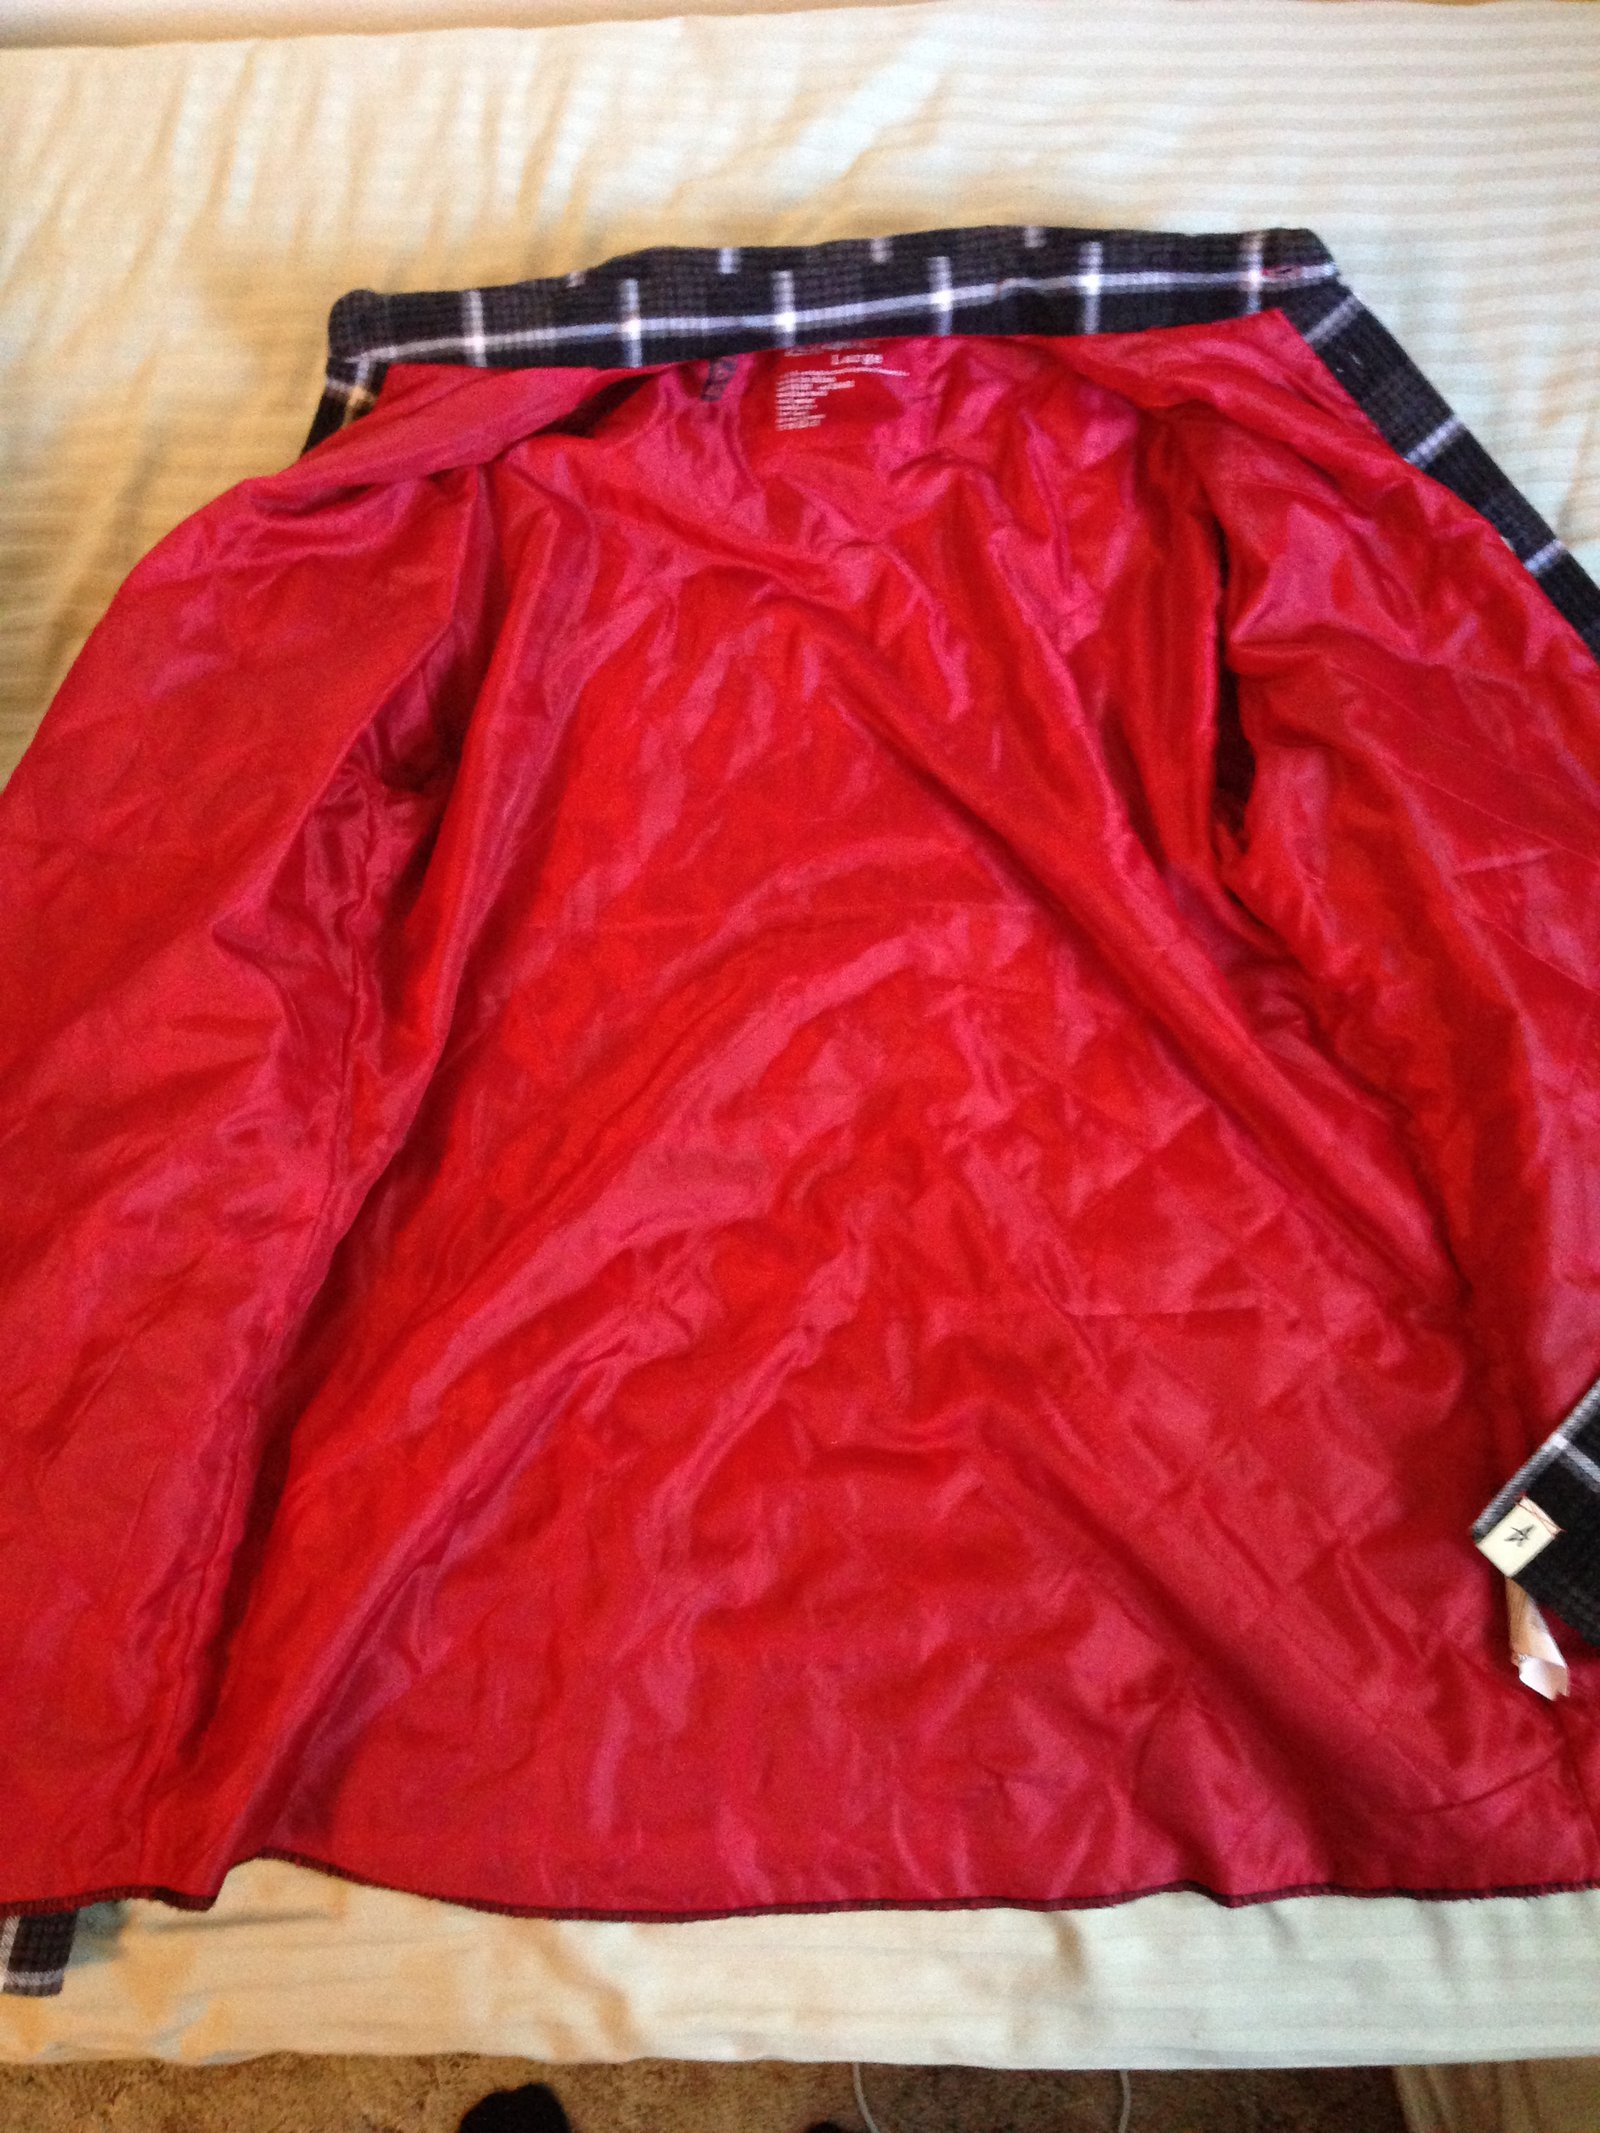 Altamount Flannel Inside